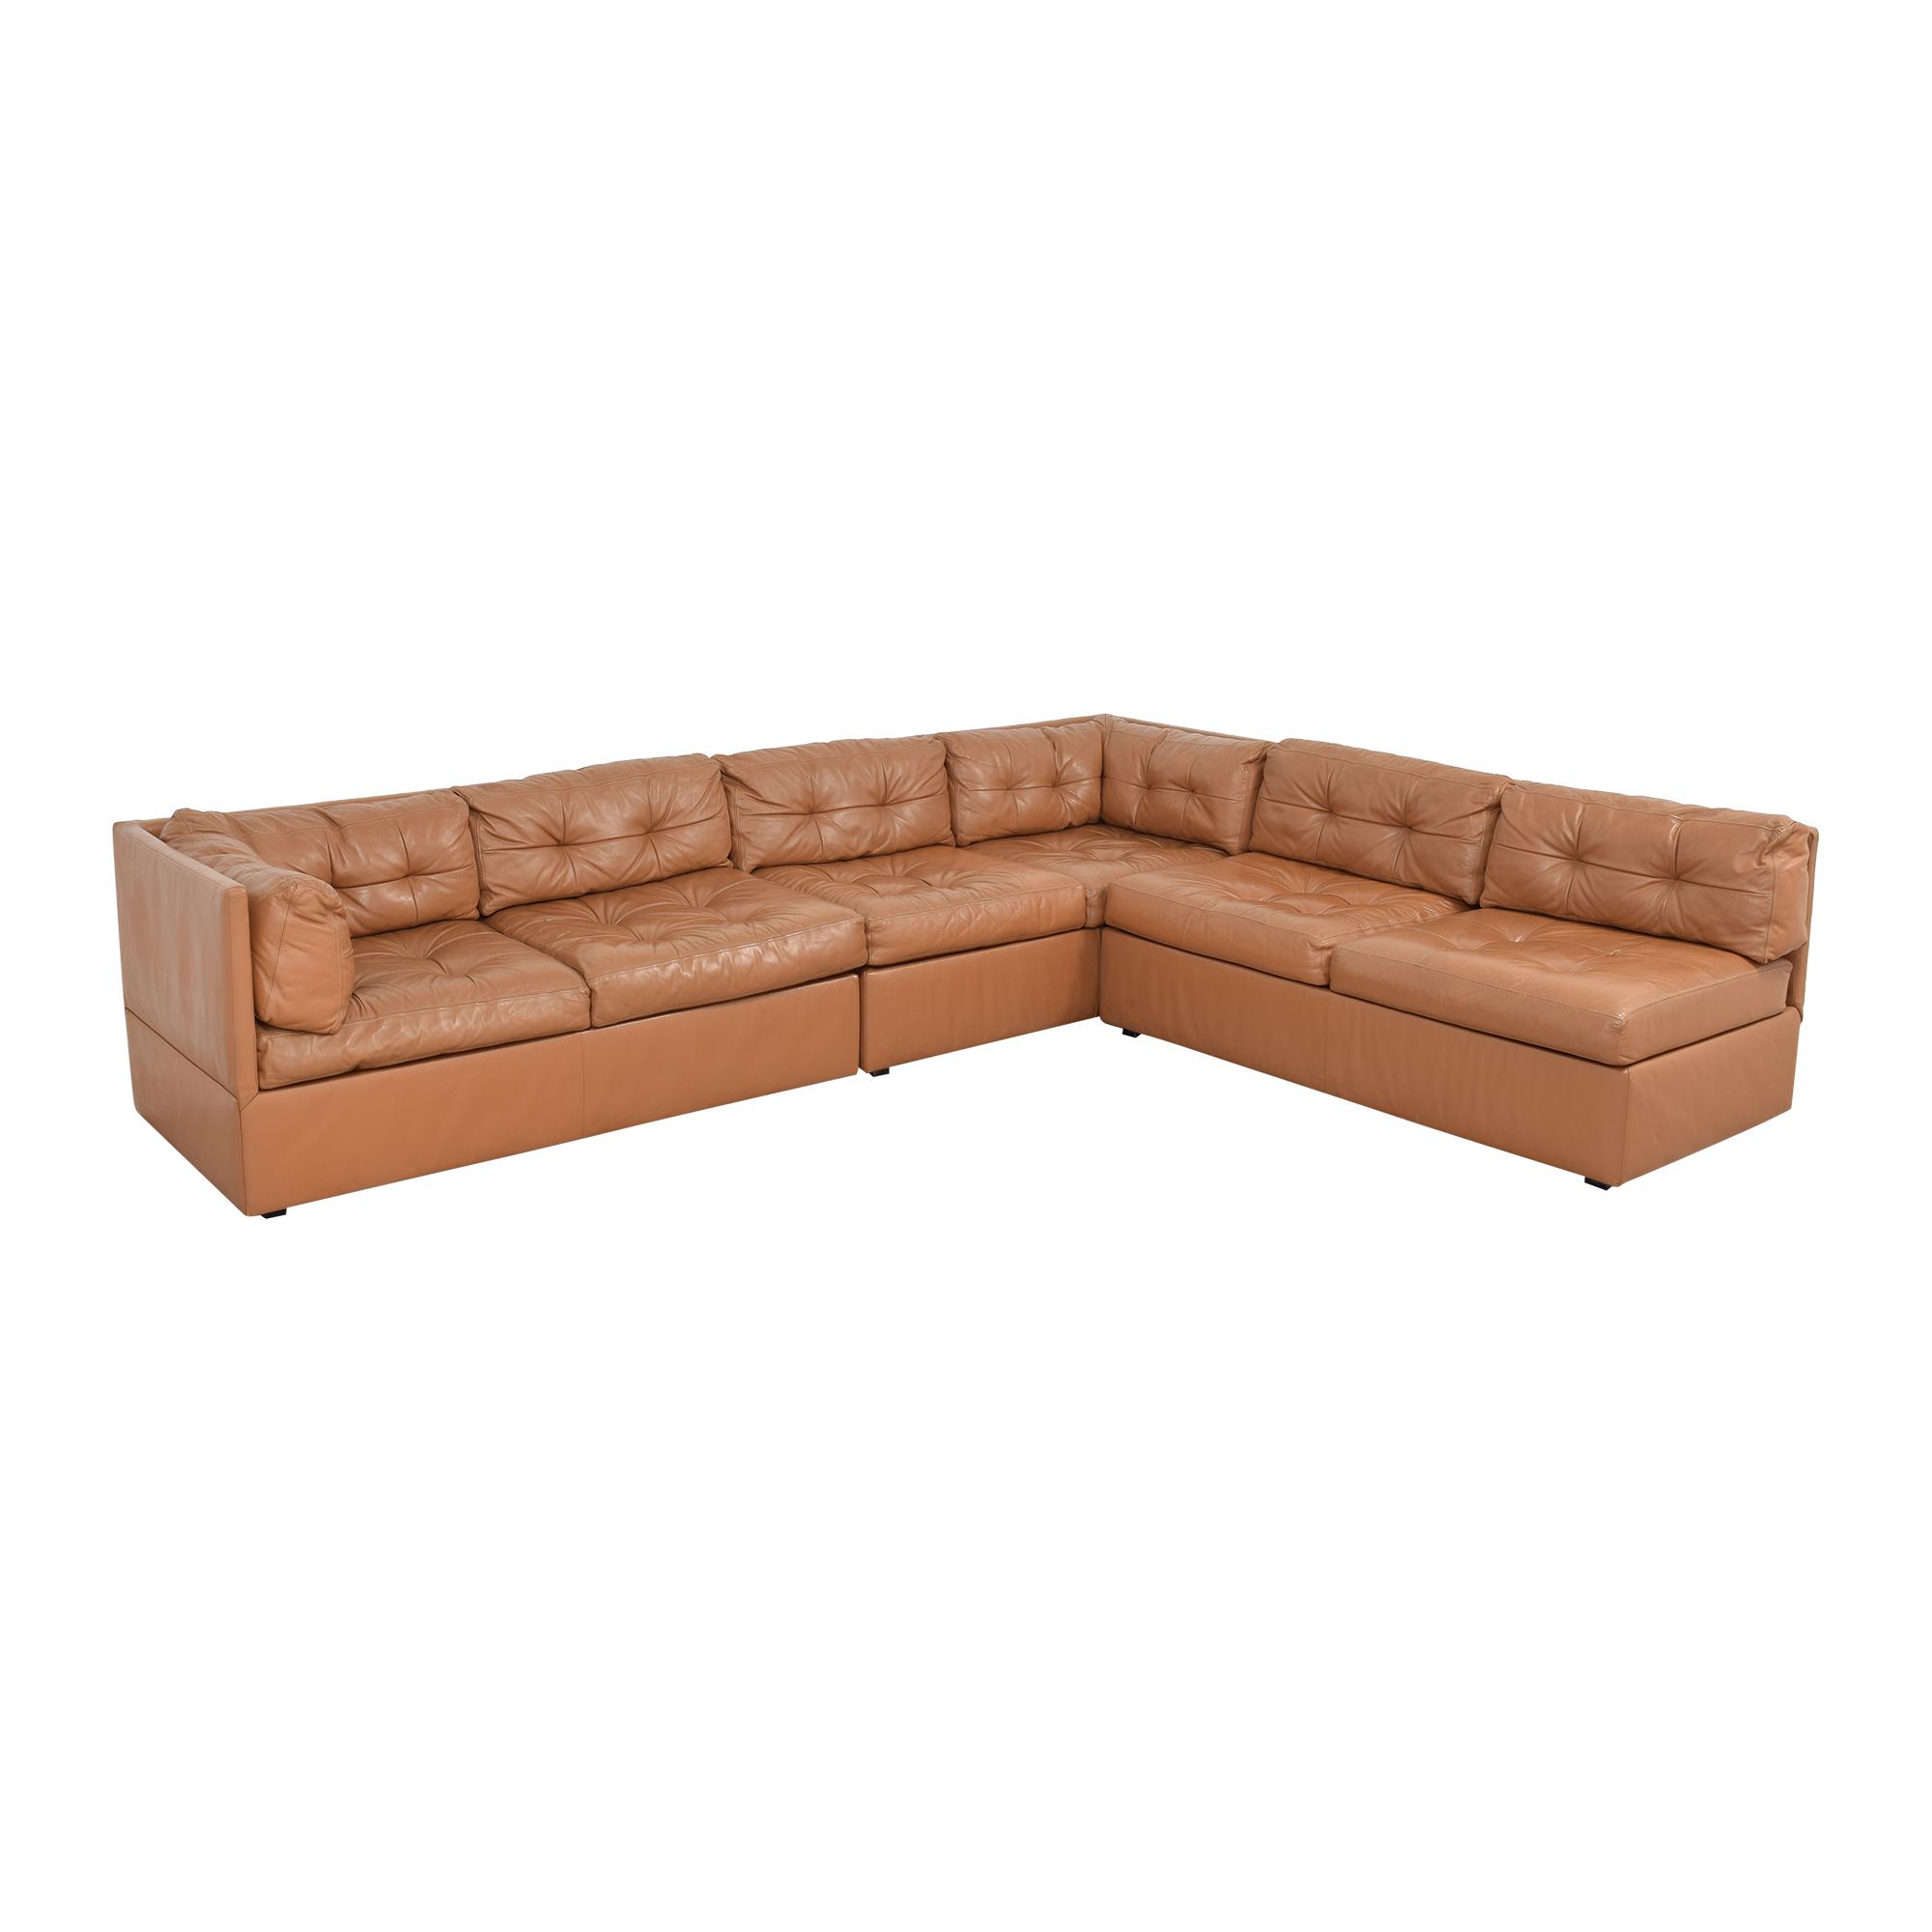 L-Shaped Sectional Sofa pa